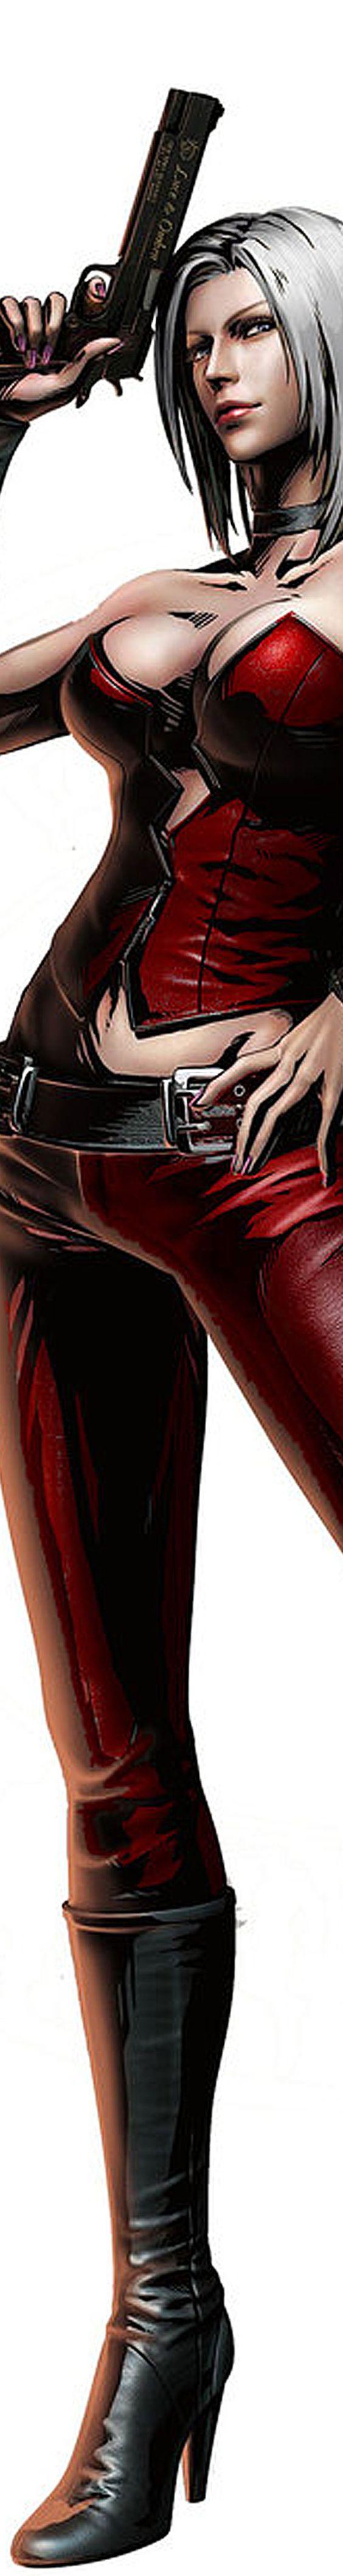 Devil May Cry - Trish